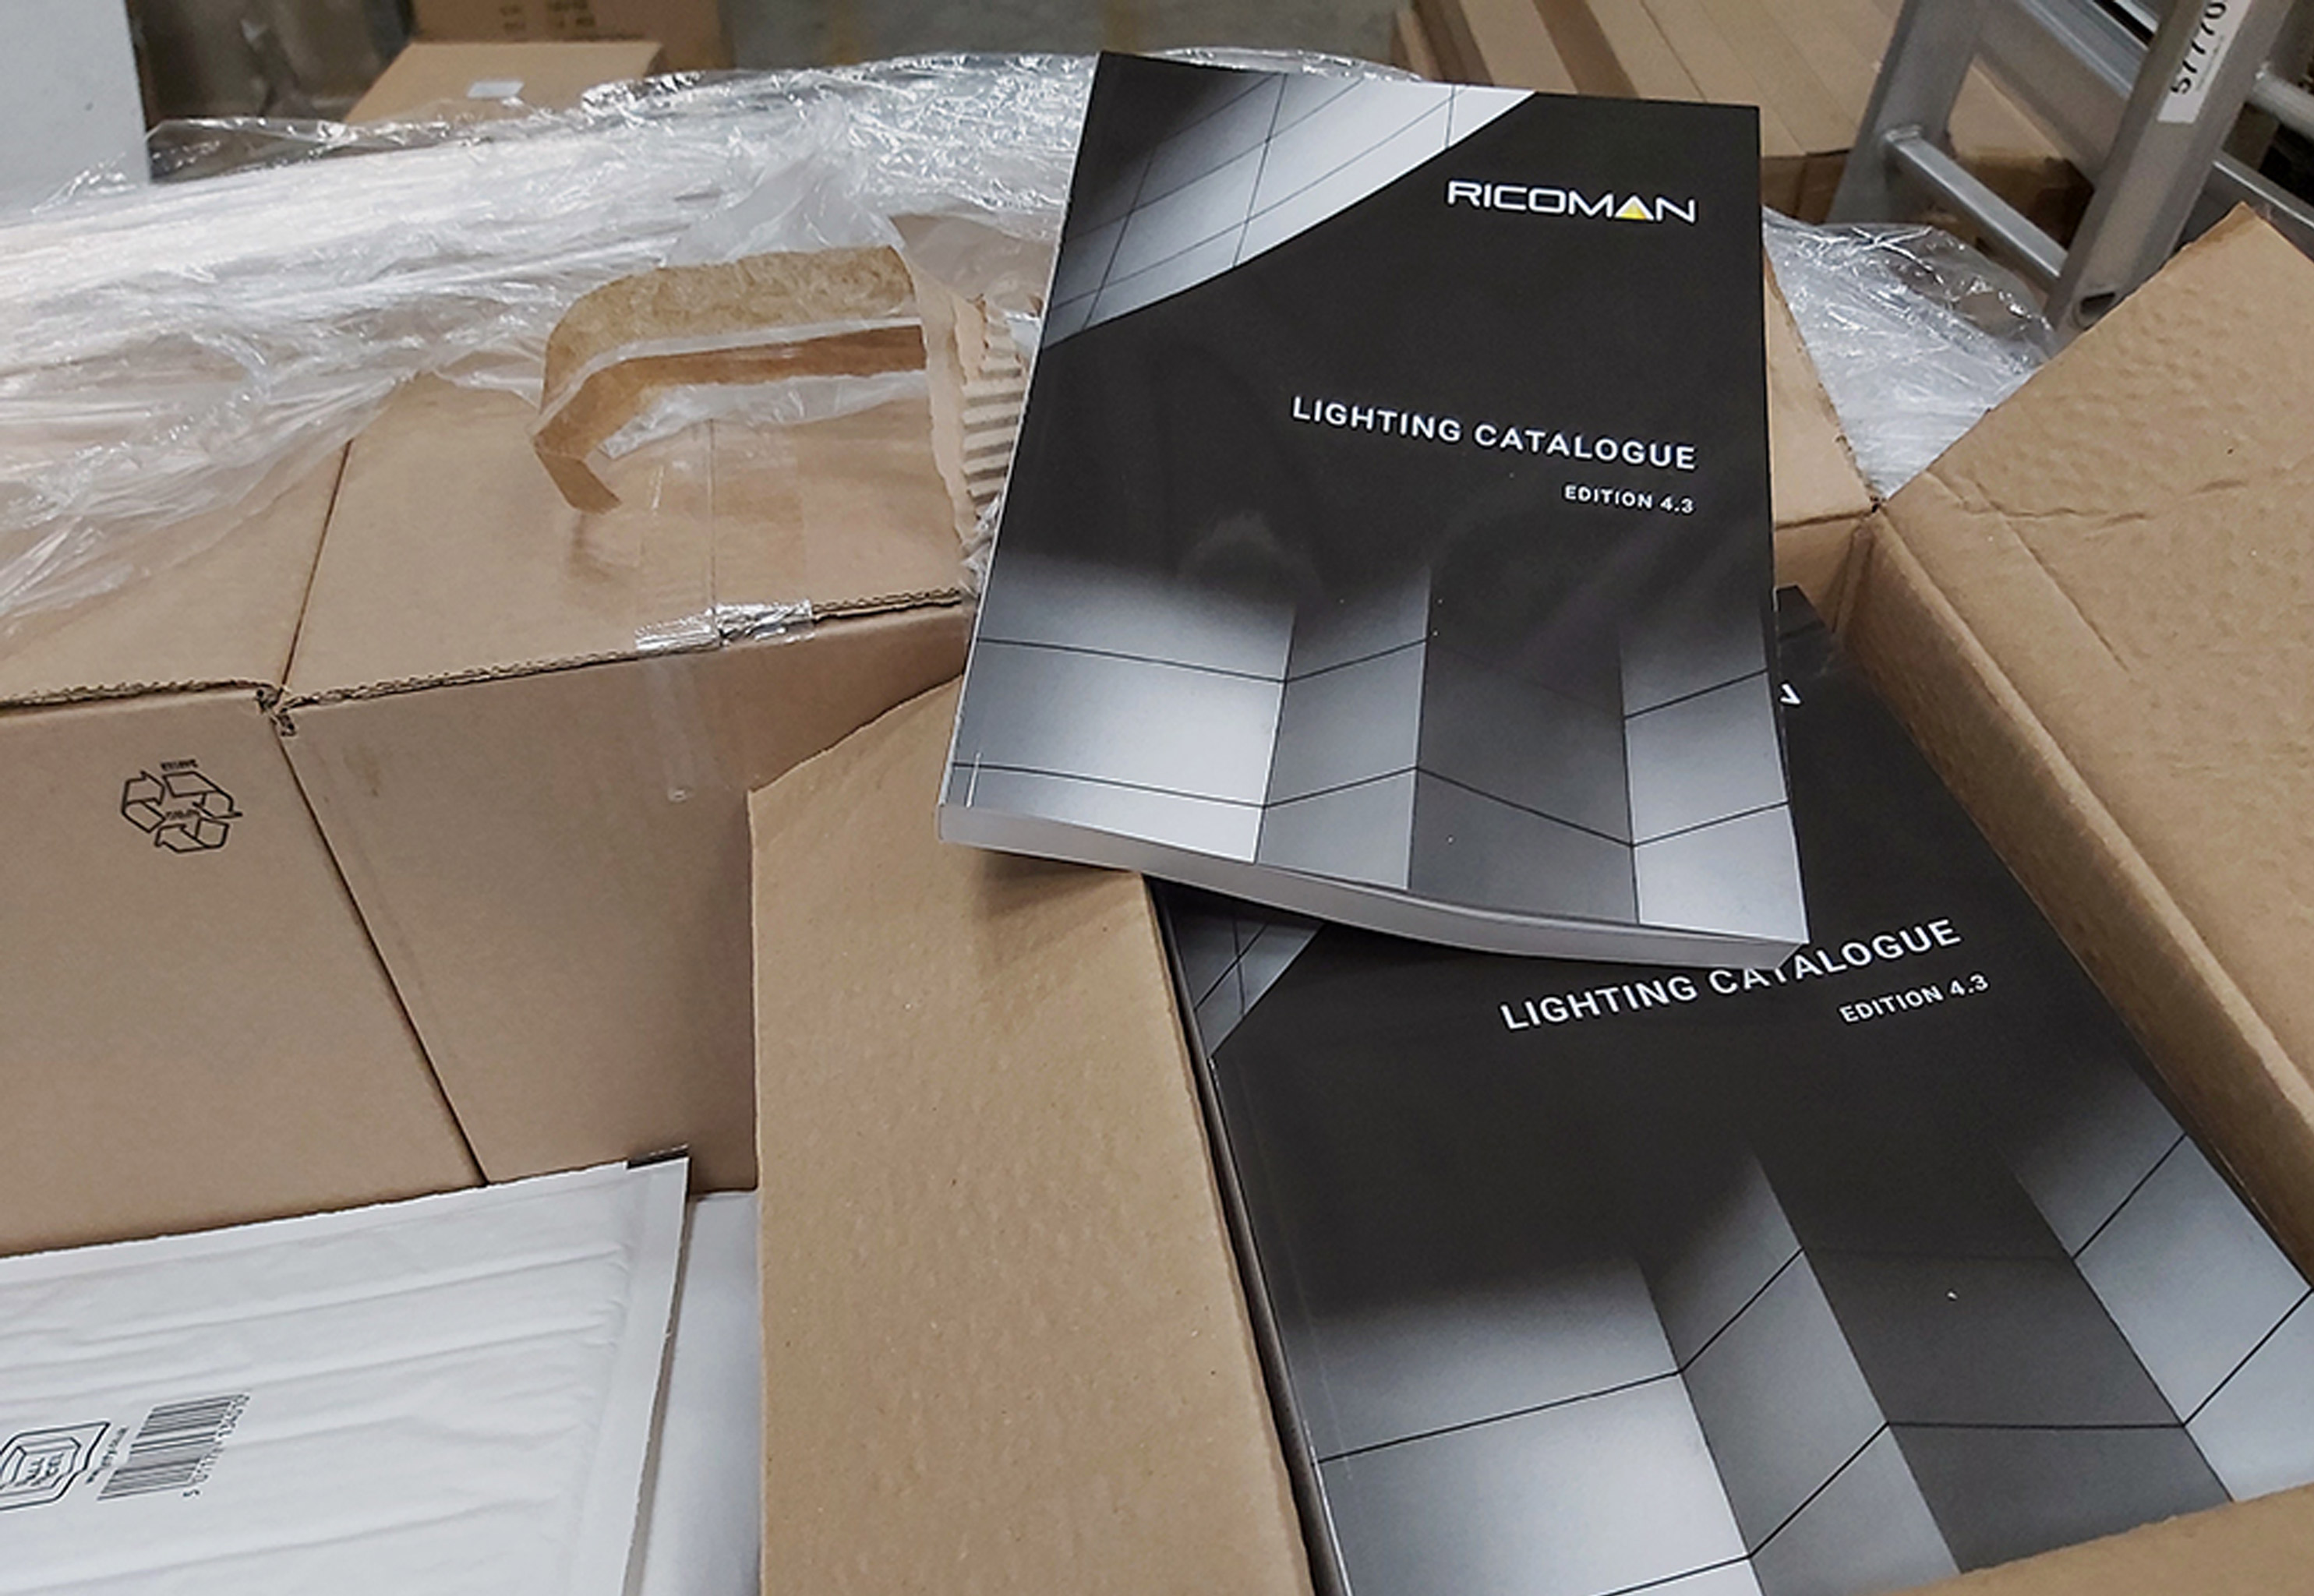 Ricoman Lighting Catalogue 4.3 Edition